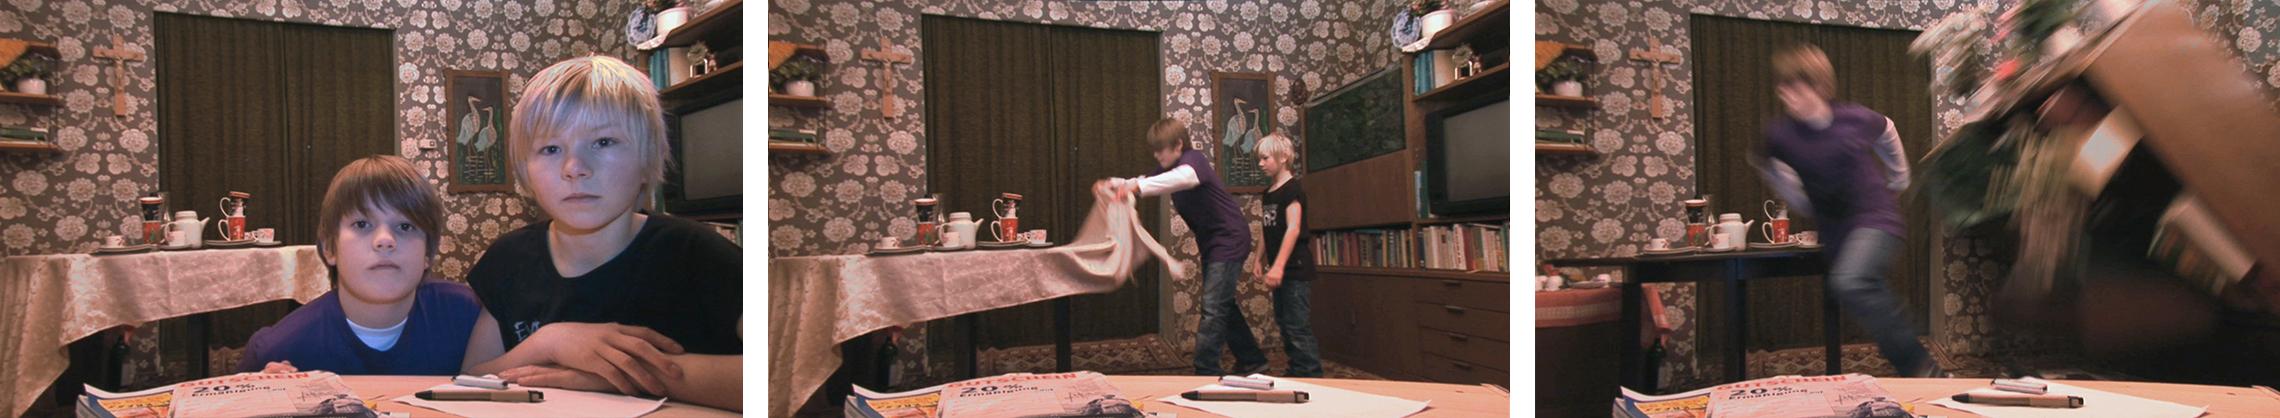 MICHEL & SVEN – The Table Cloth Magic Trick